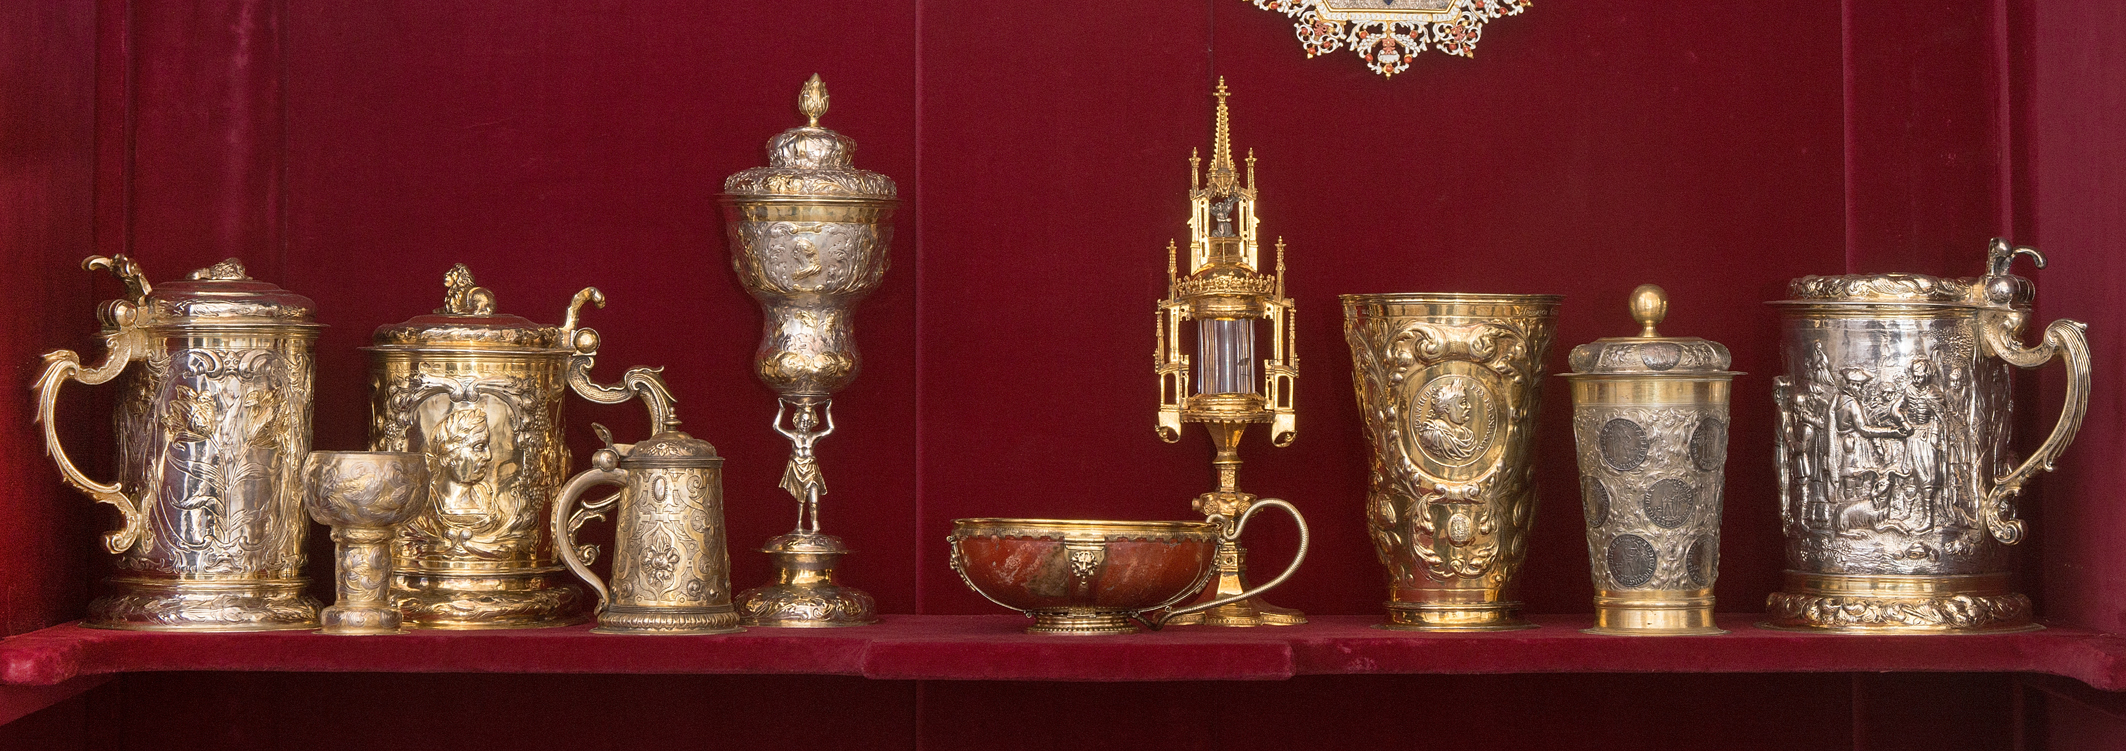 Puchary i kufle - Antykamera Królowej